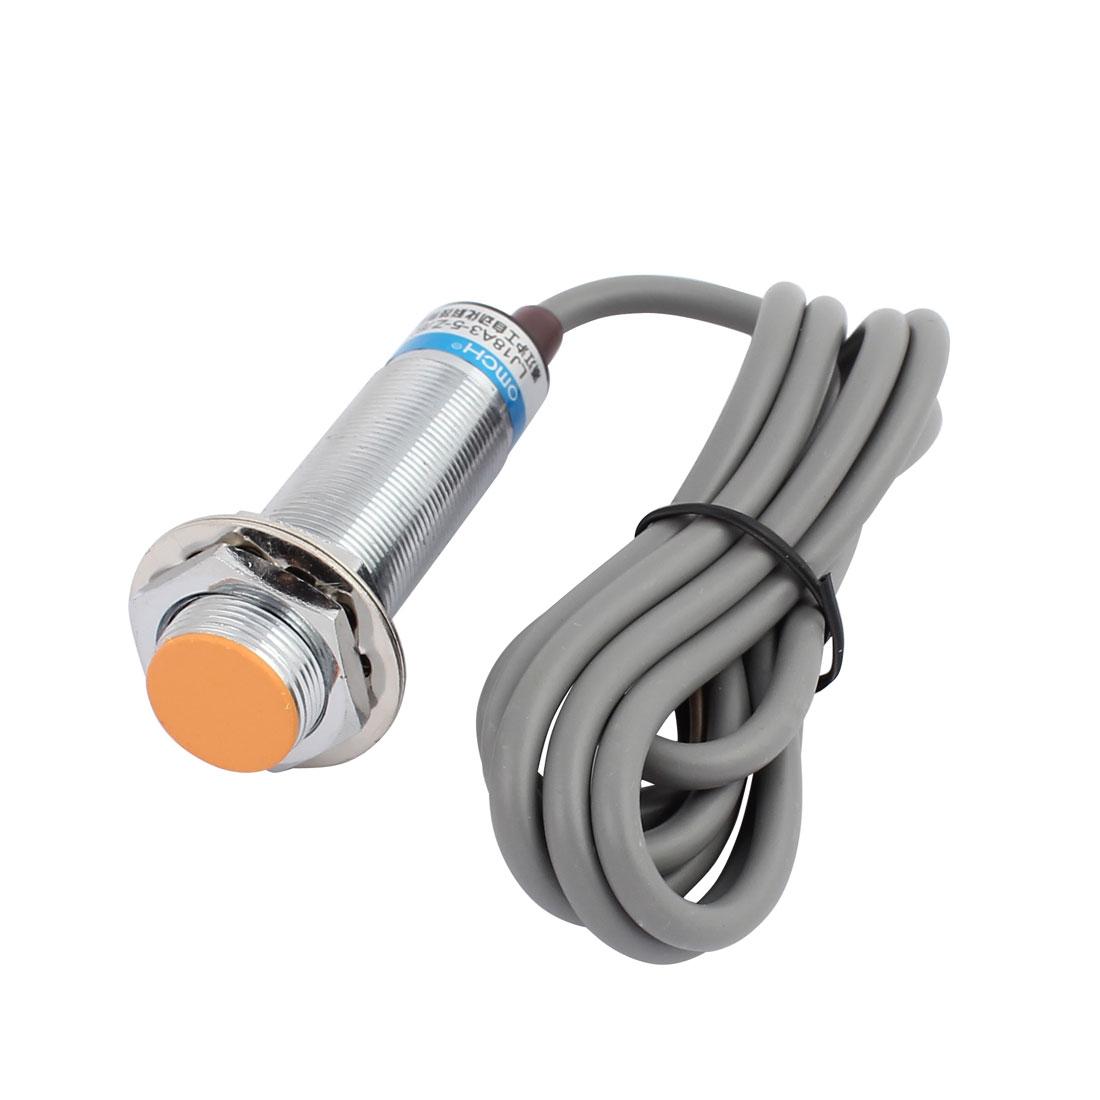 LJ18A3-5-Z/BX DC 6-36V 300mA NPN NO 5mm Inductive Proximity Sensor Switch 3-wire